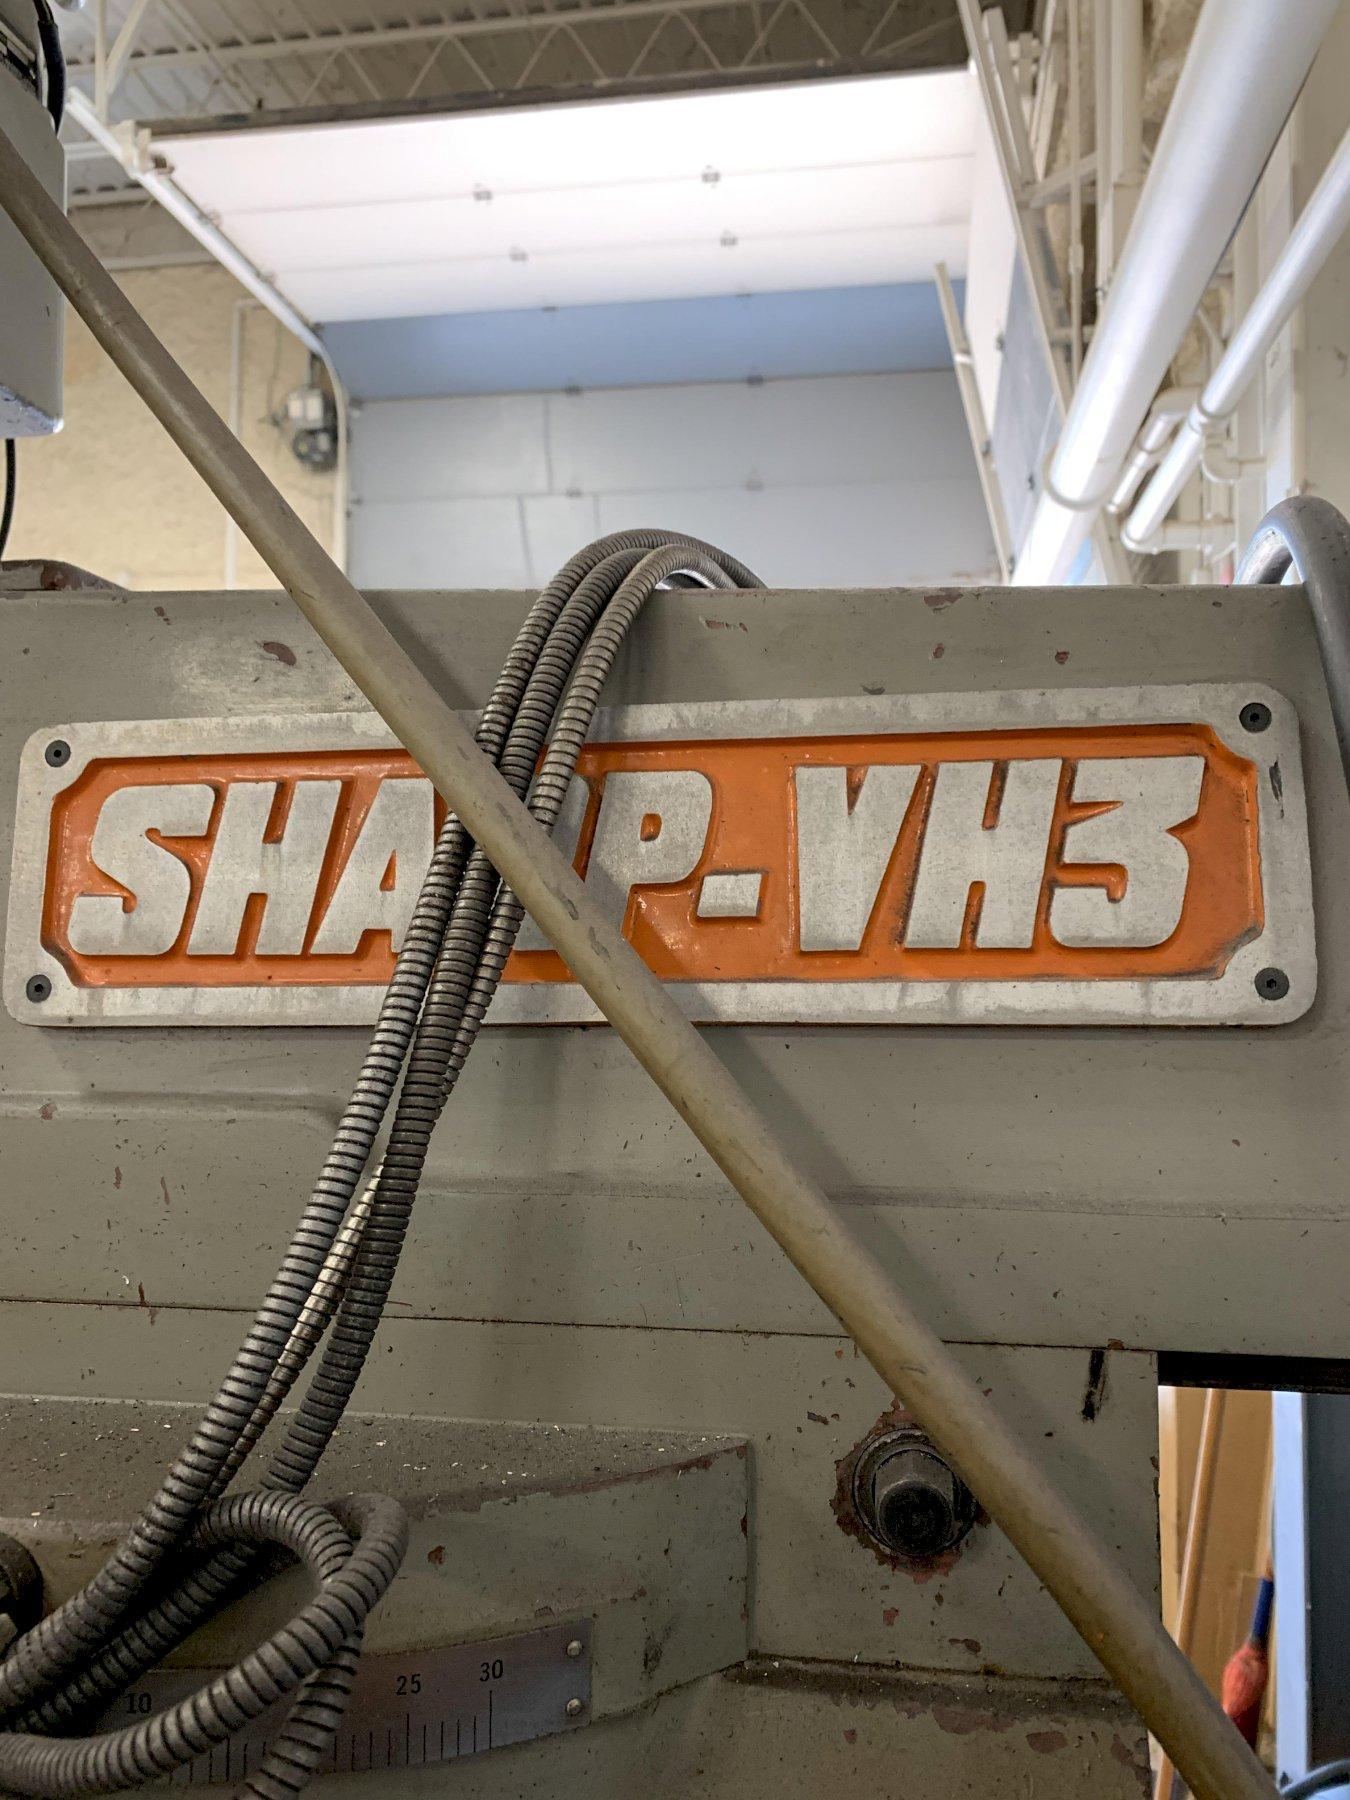 Sharp KF-V3 Heavy Duty Vertical Milling Machine, S/N 93007.